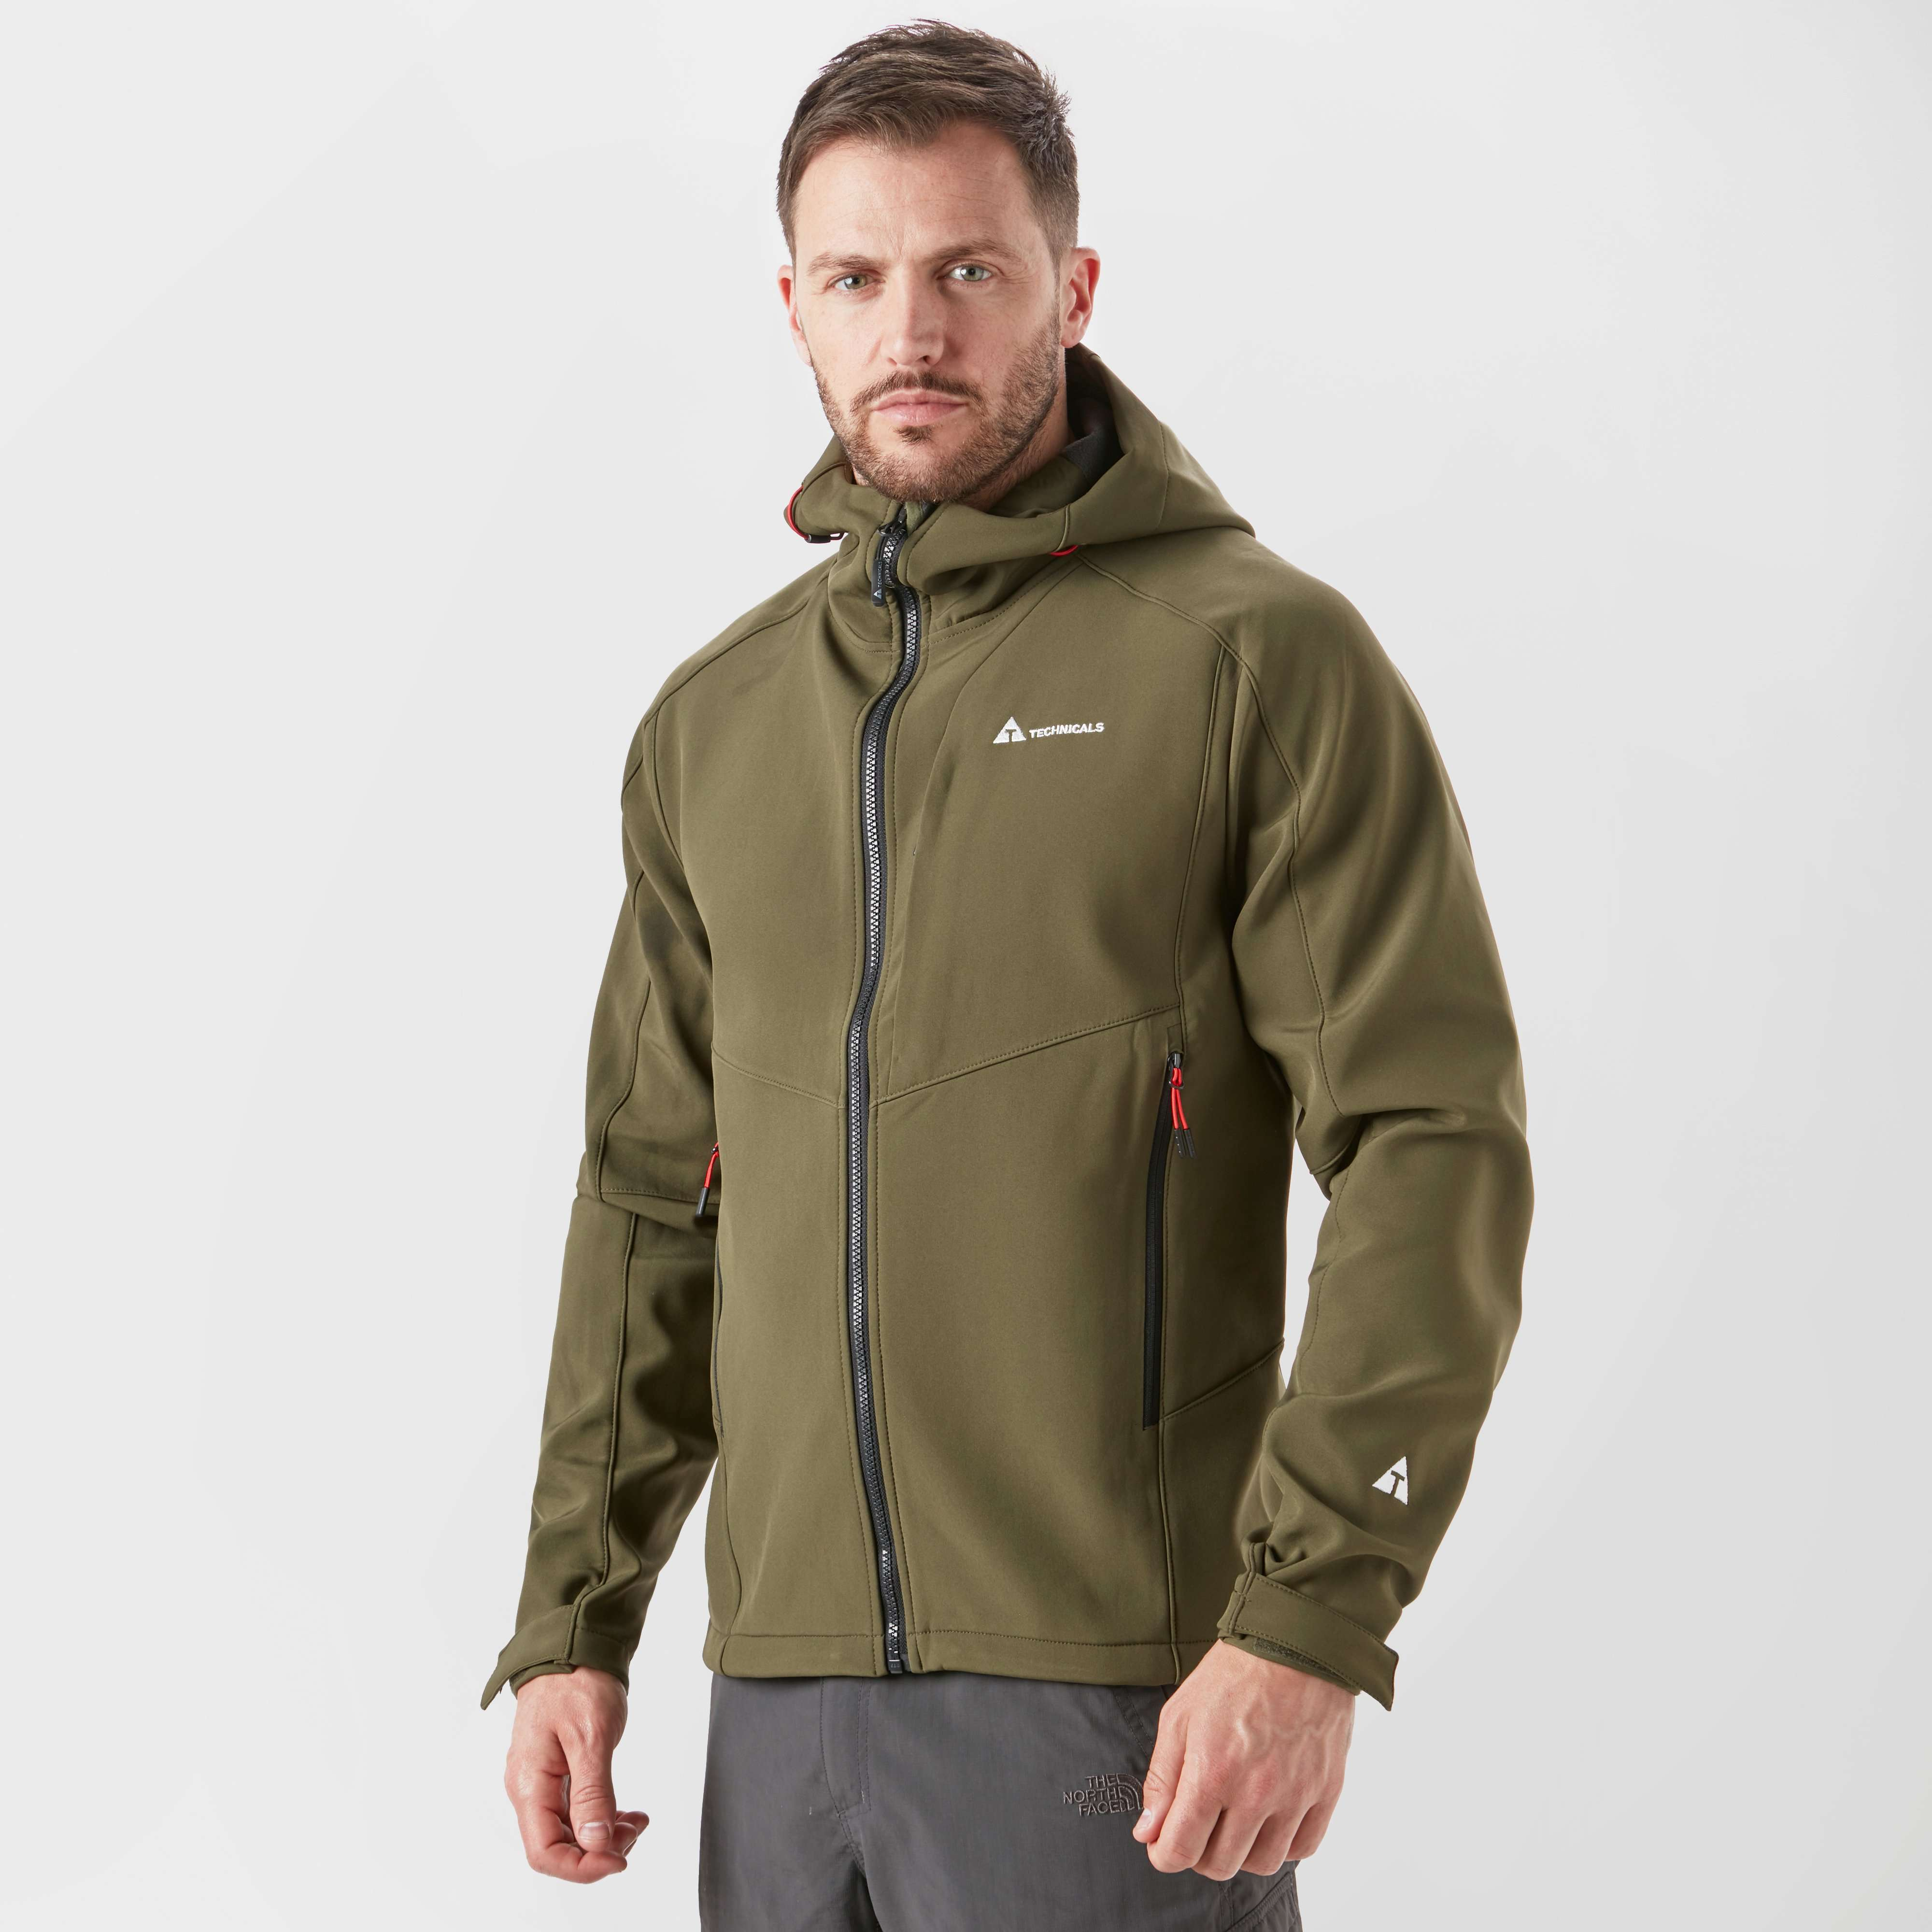 TECHNICALS Men's Force Softshell Jacket